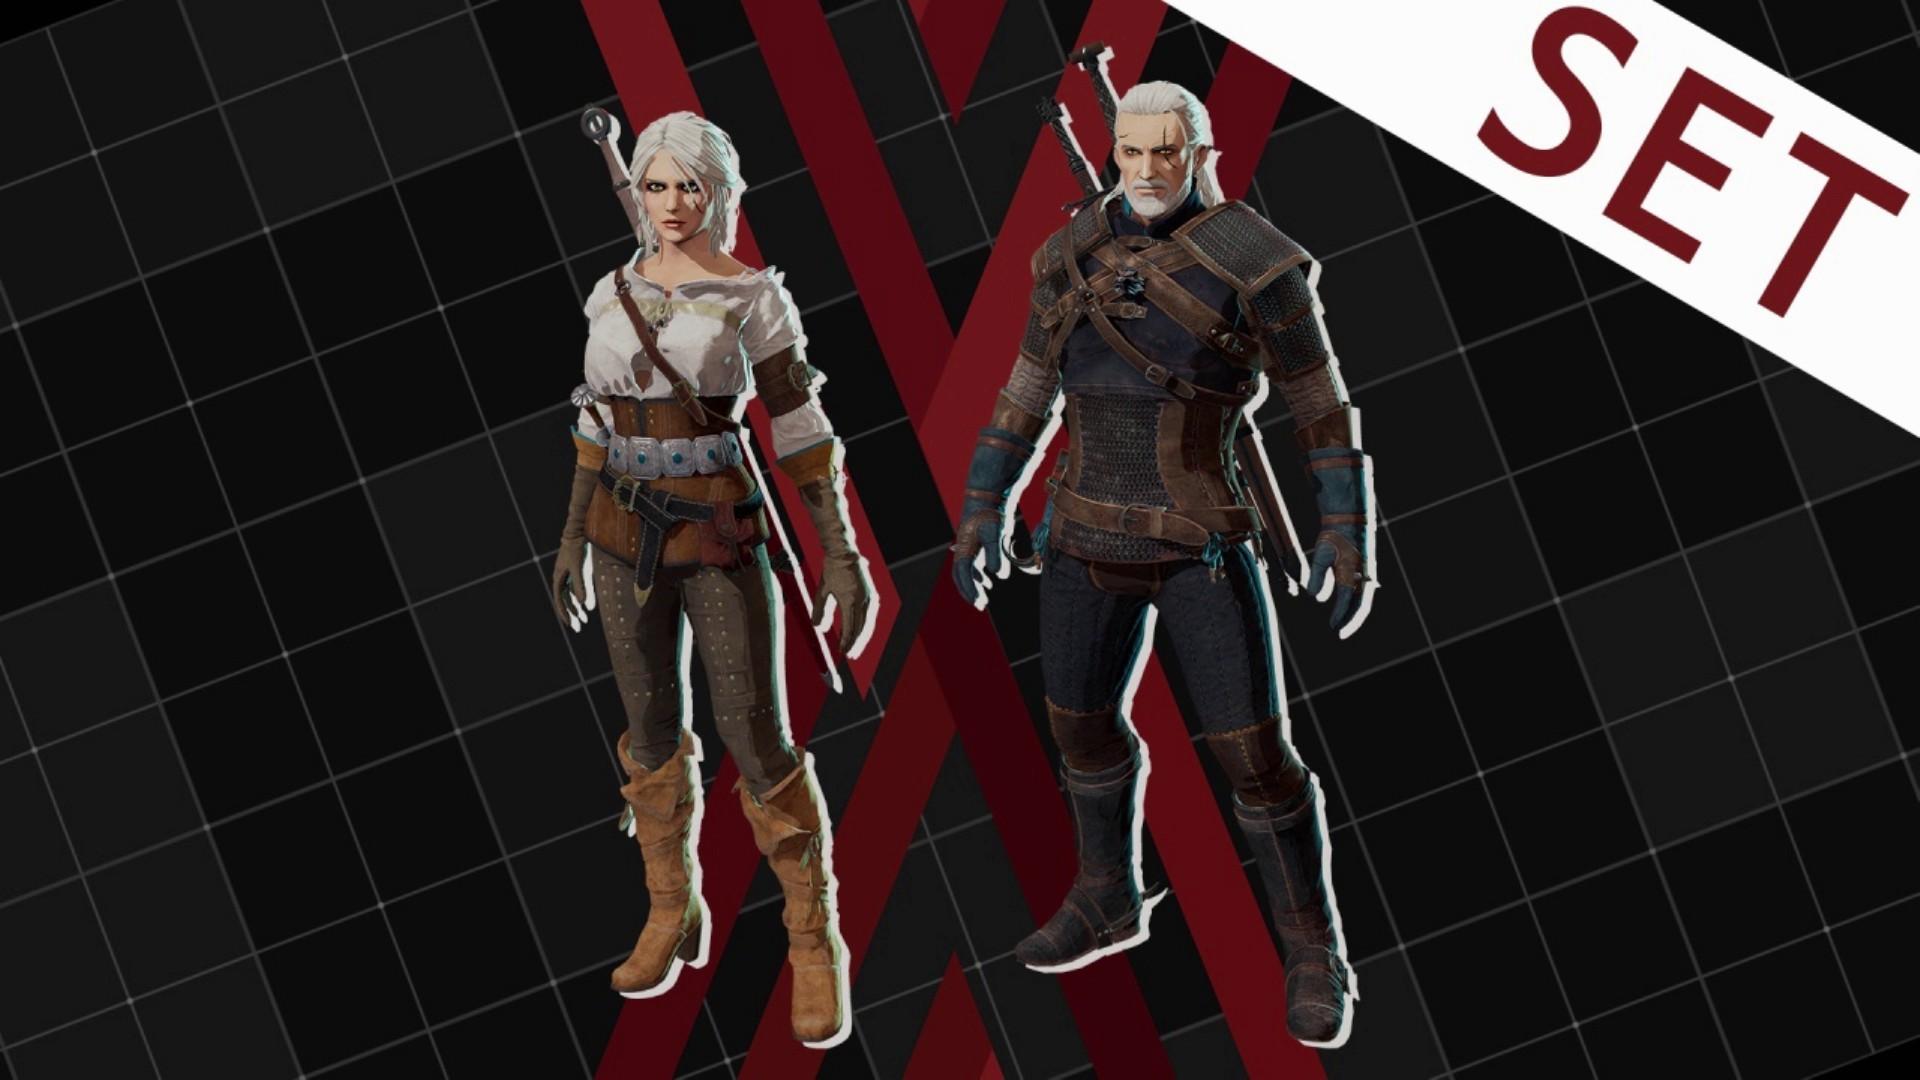 Ciri i Geralt - Deamon X Machina DLC